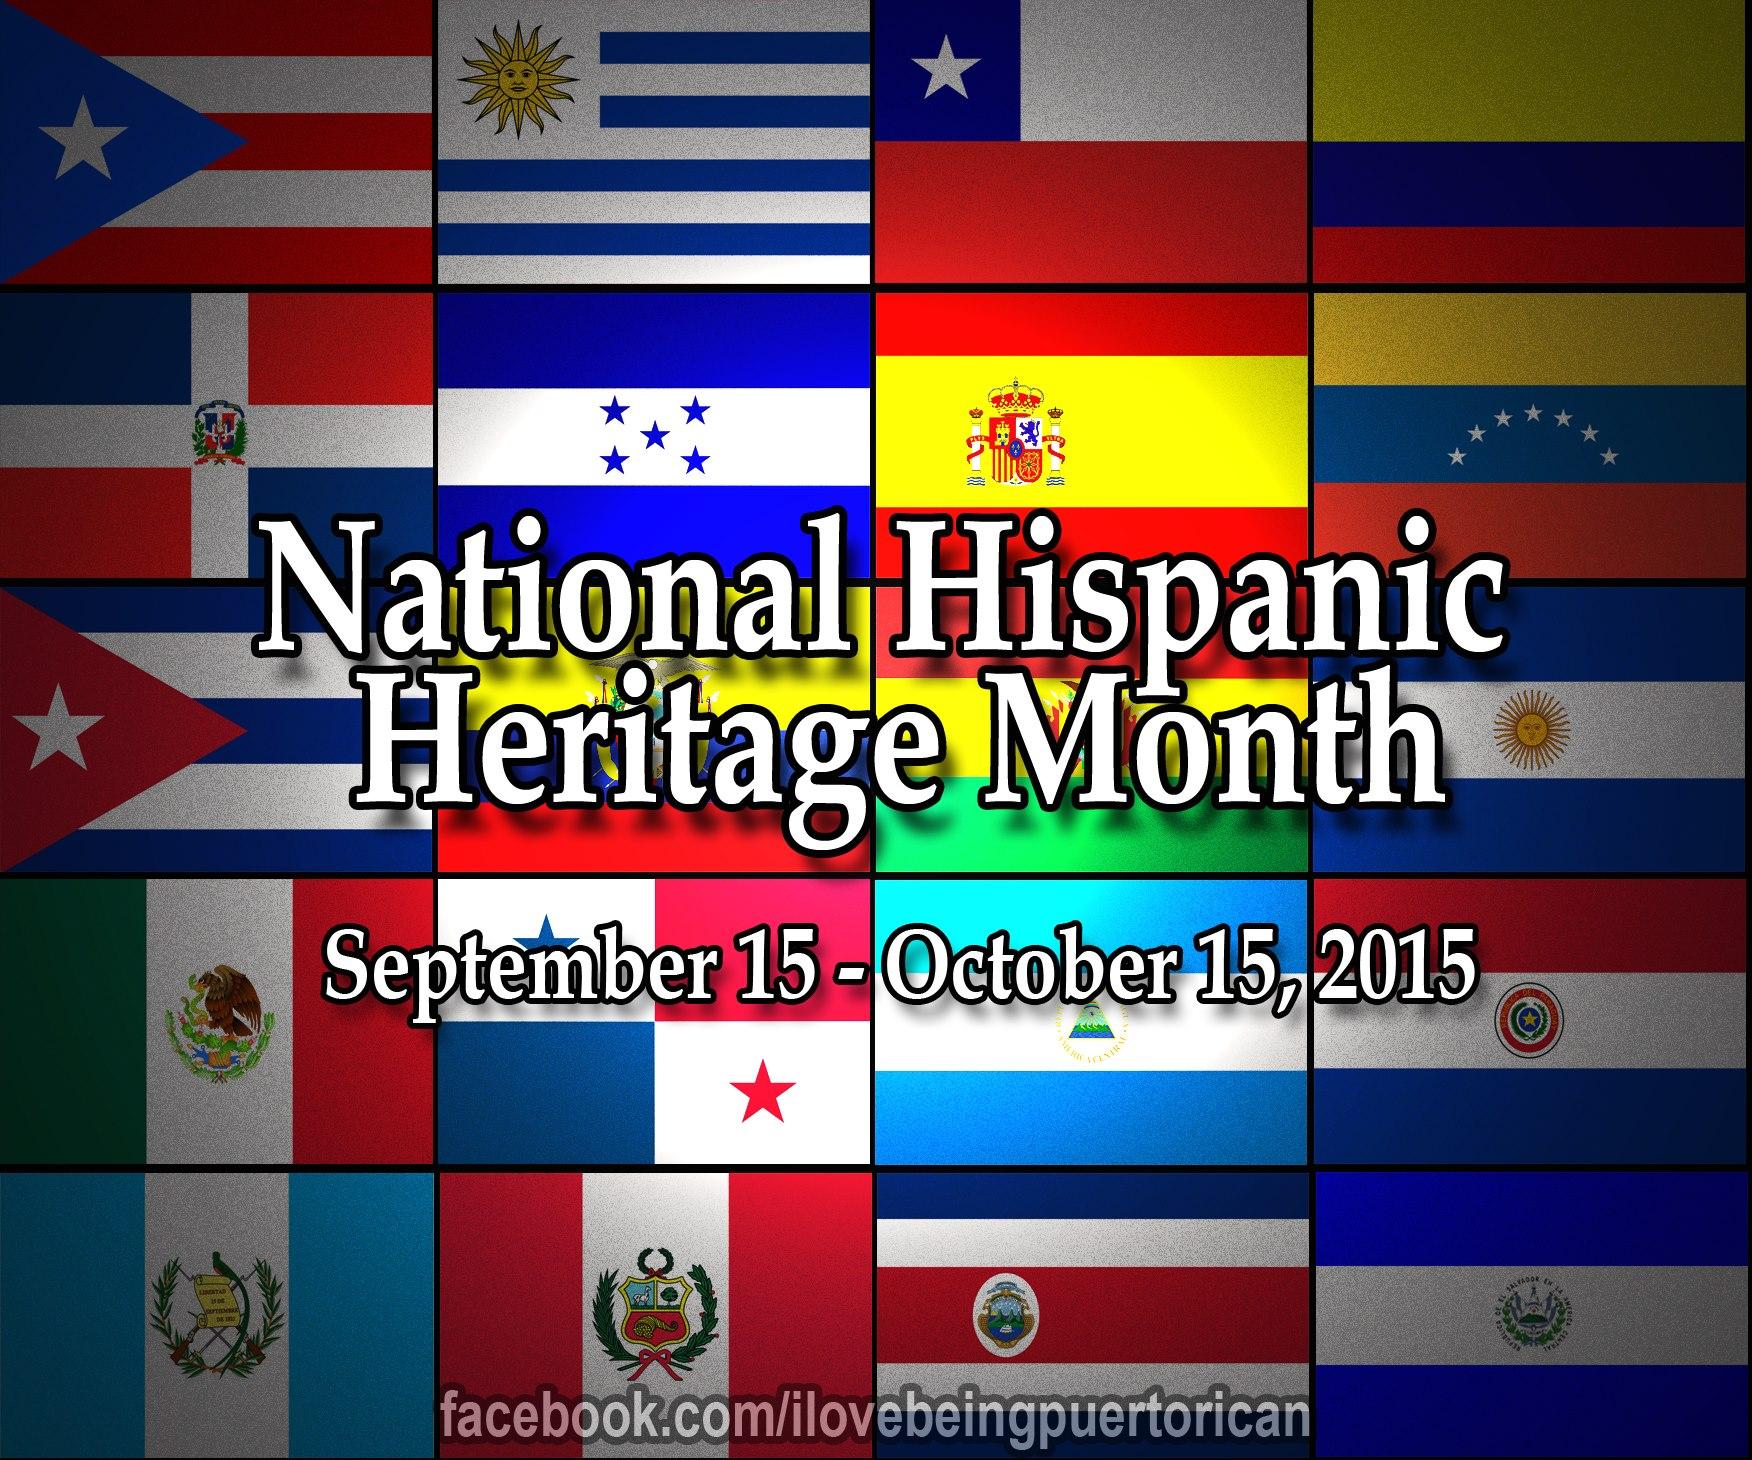 National Hispanic Heritage Month 2015